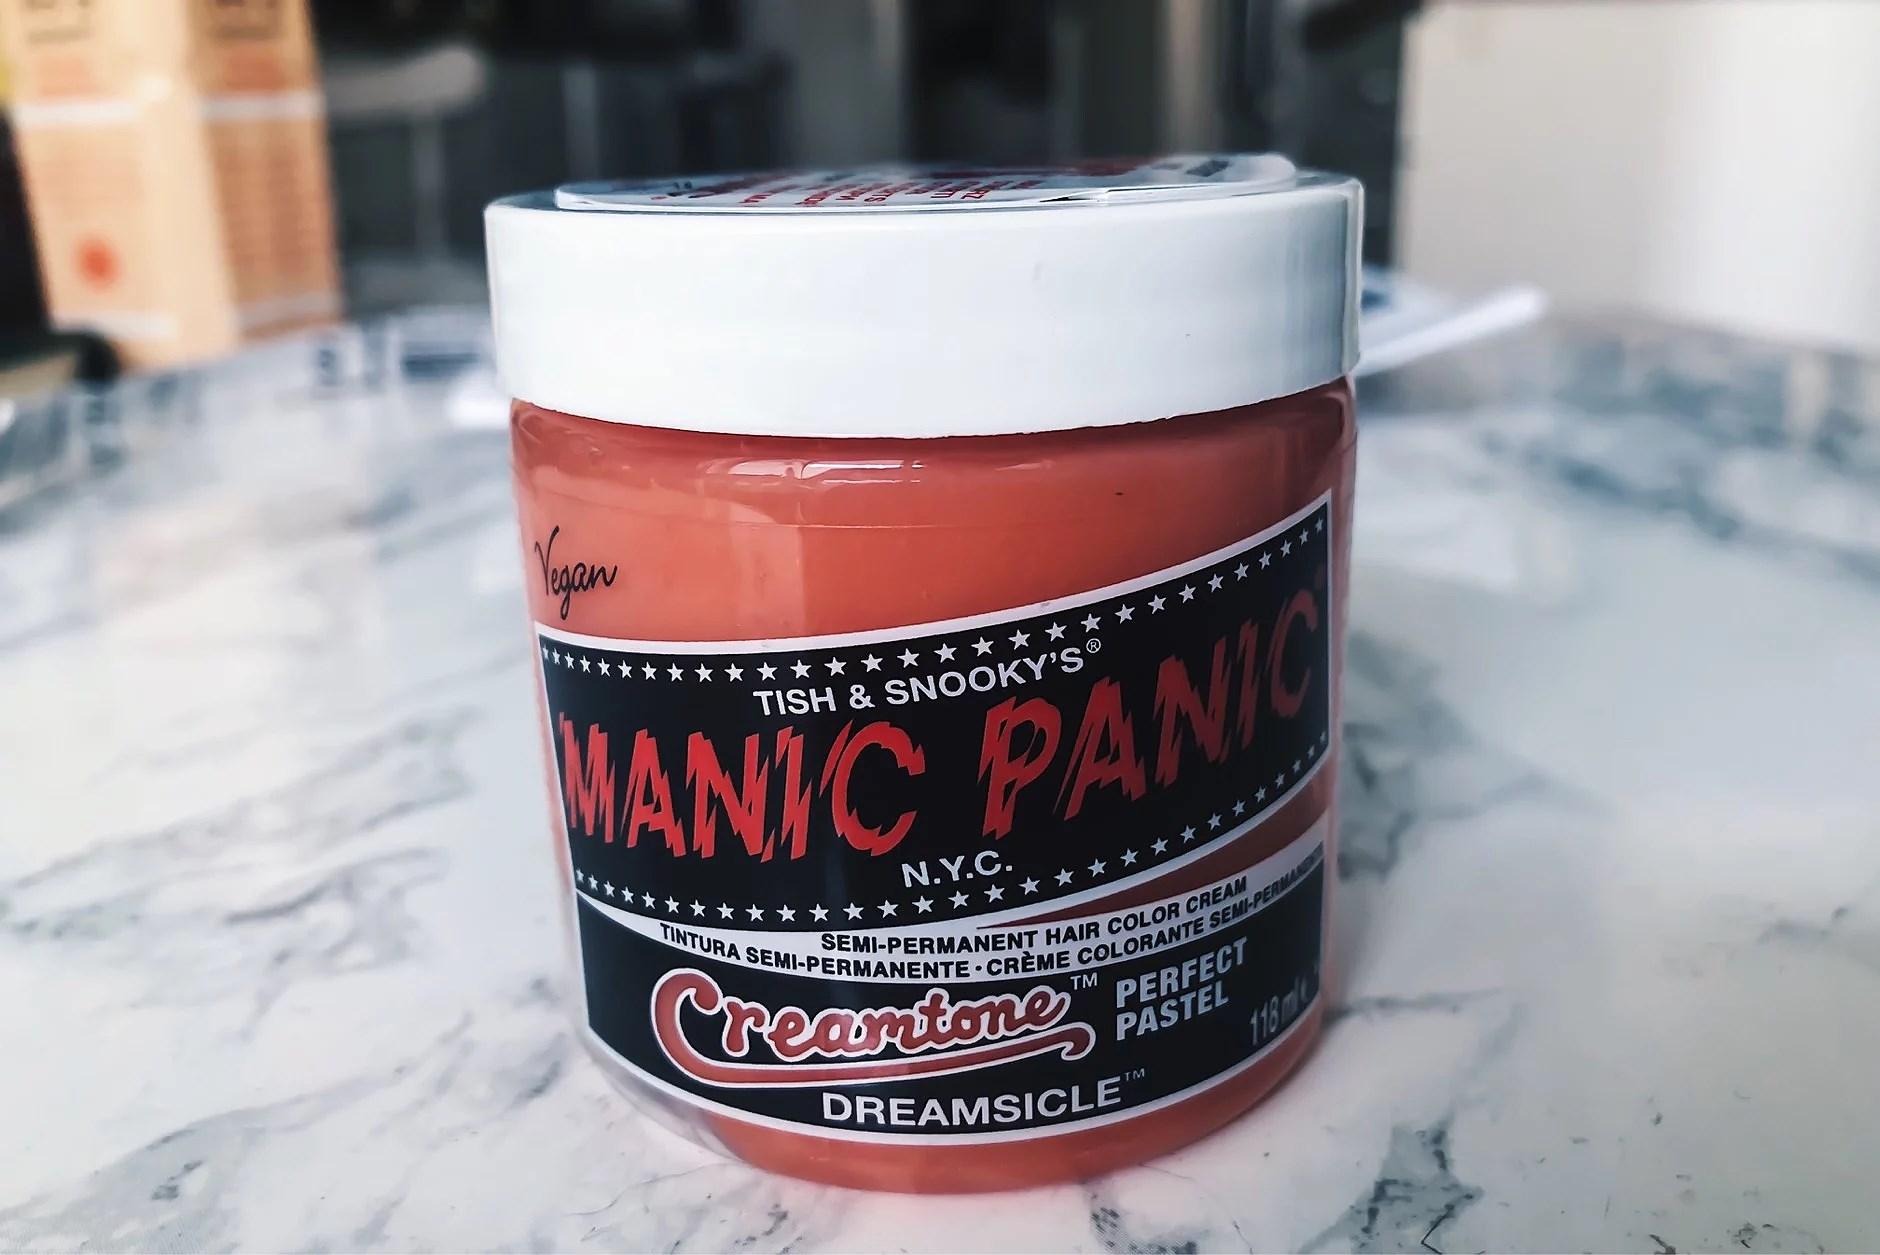 Manic Panic Dreamsicle